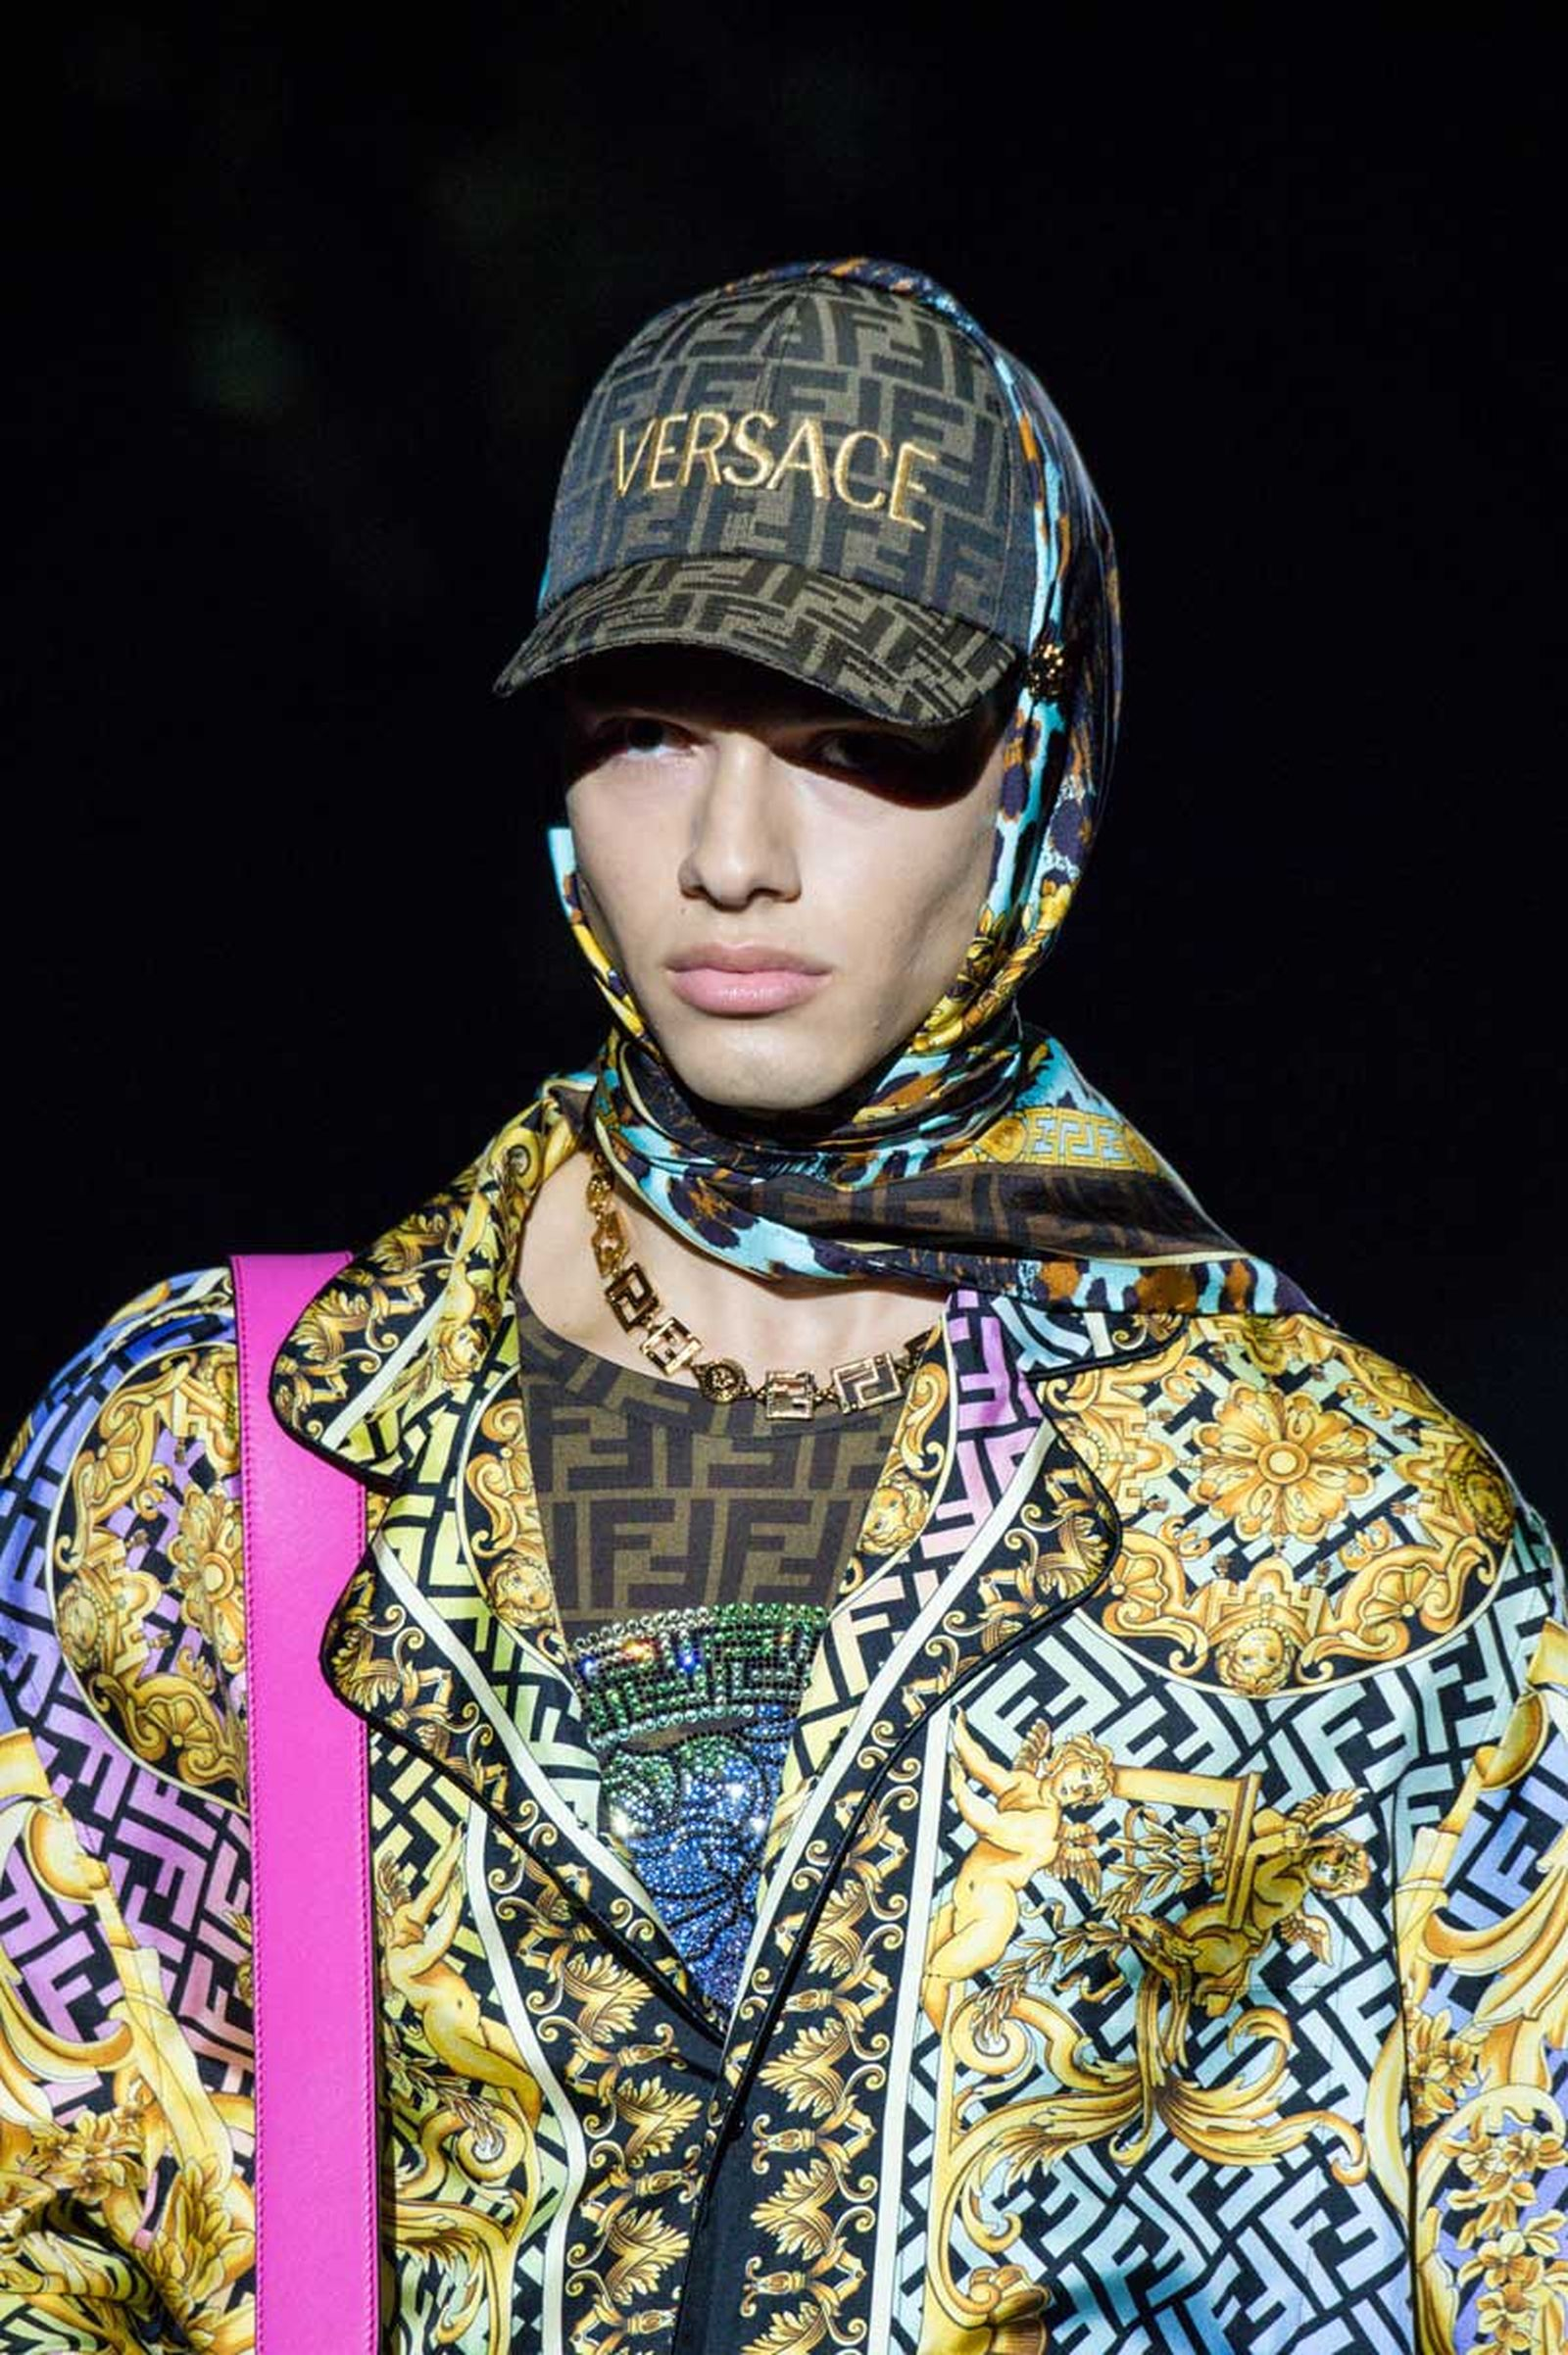 versace-fendi-collab--(25)